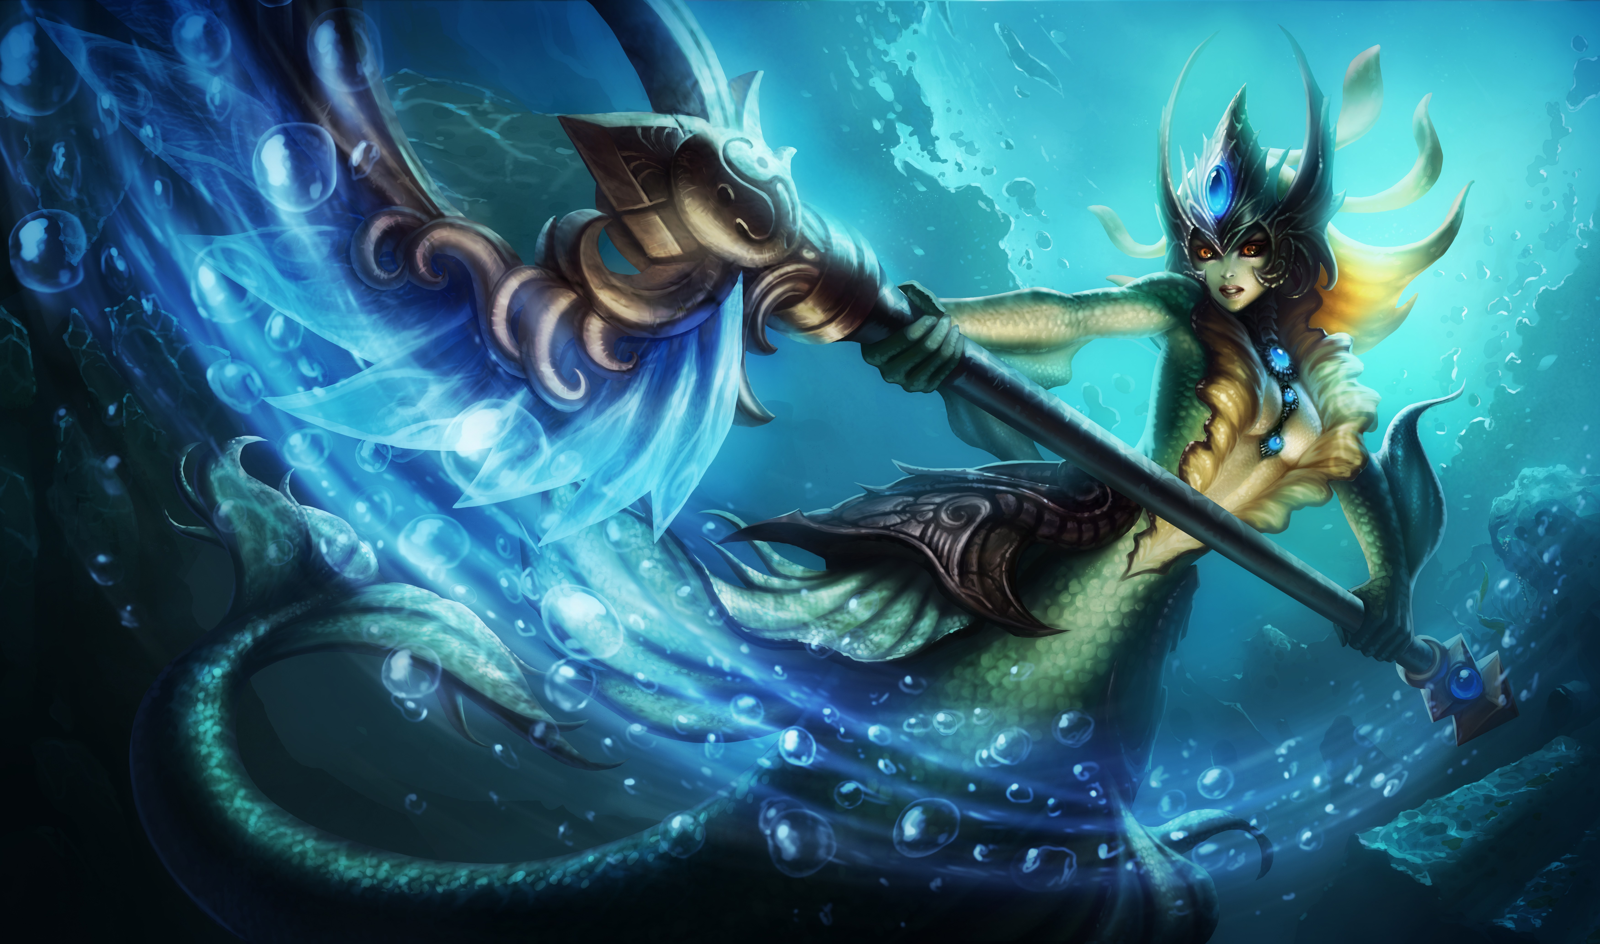 Classic Nami Splash Art 4k HD Wallpaper Official Artwork League of Legends lol